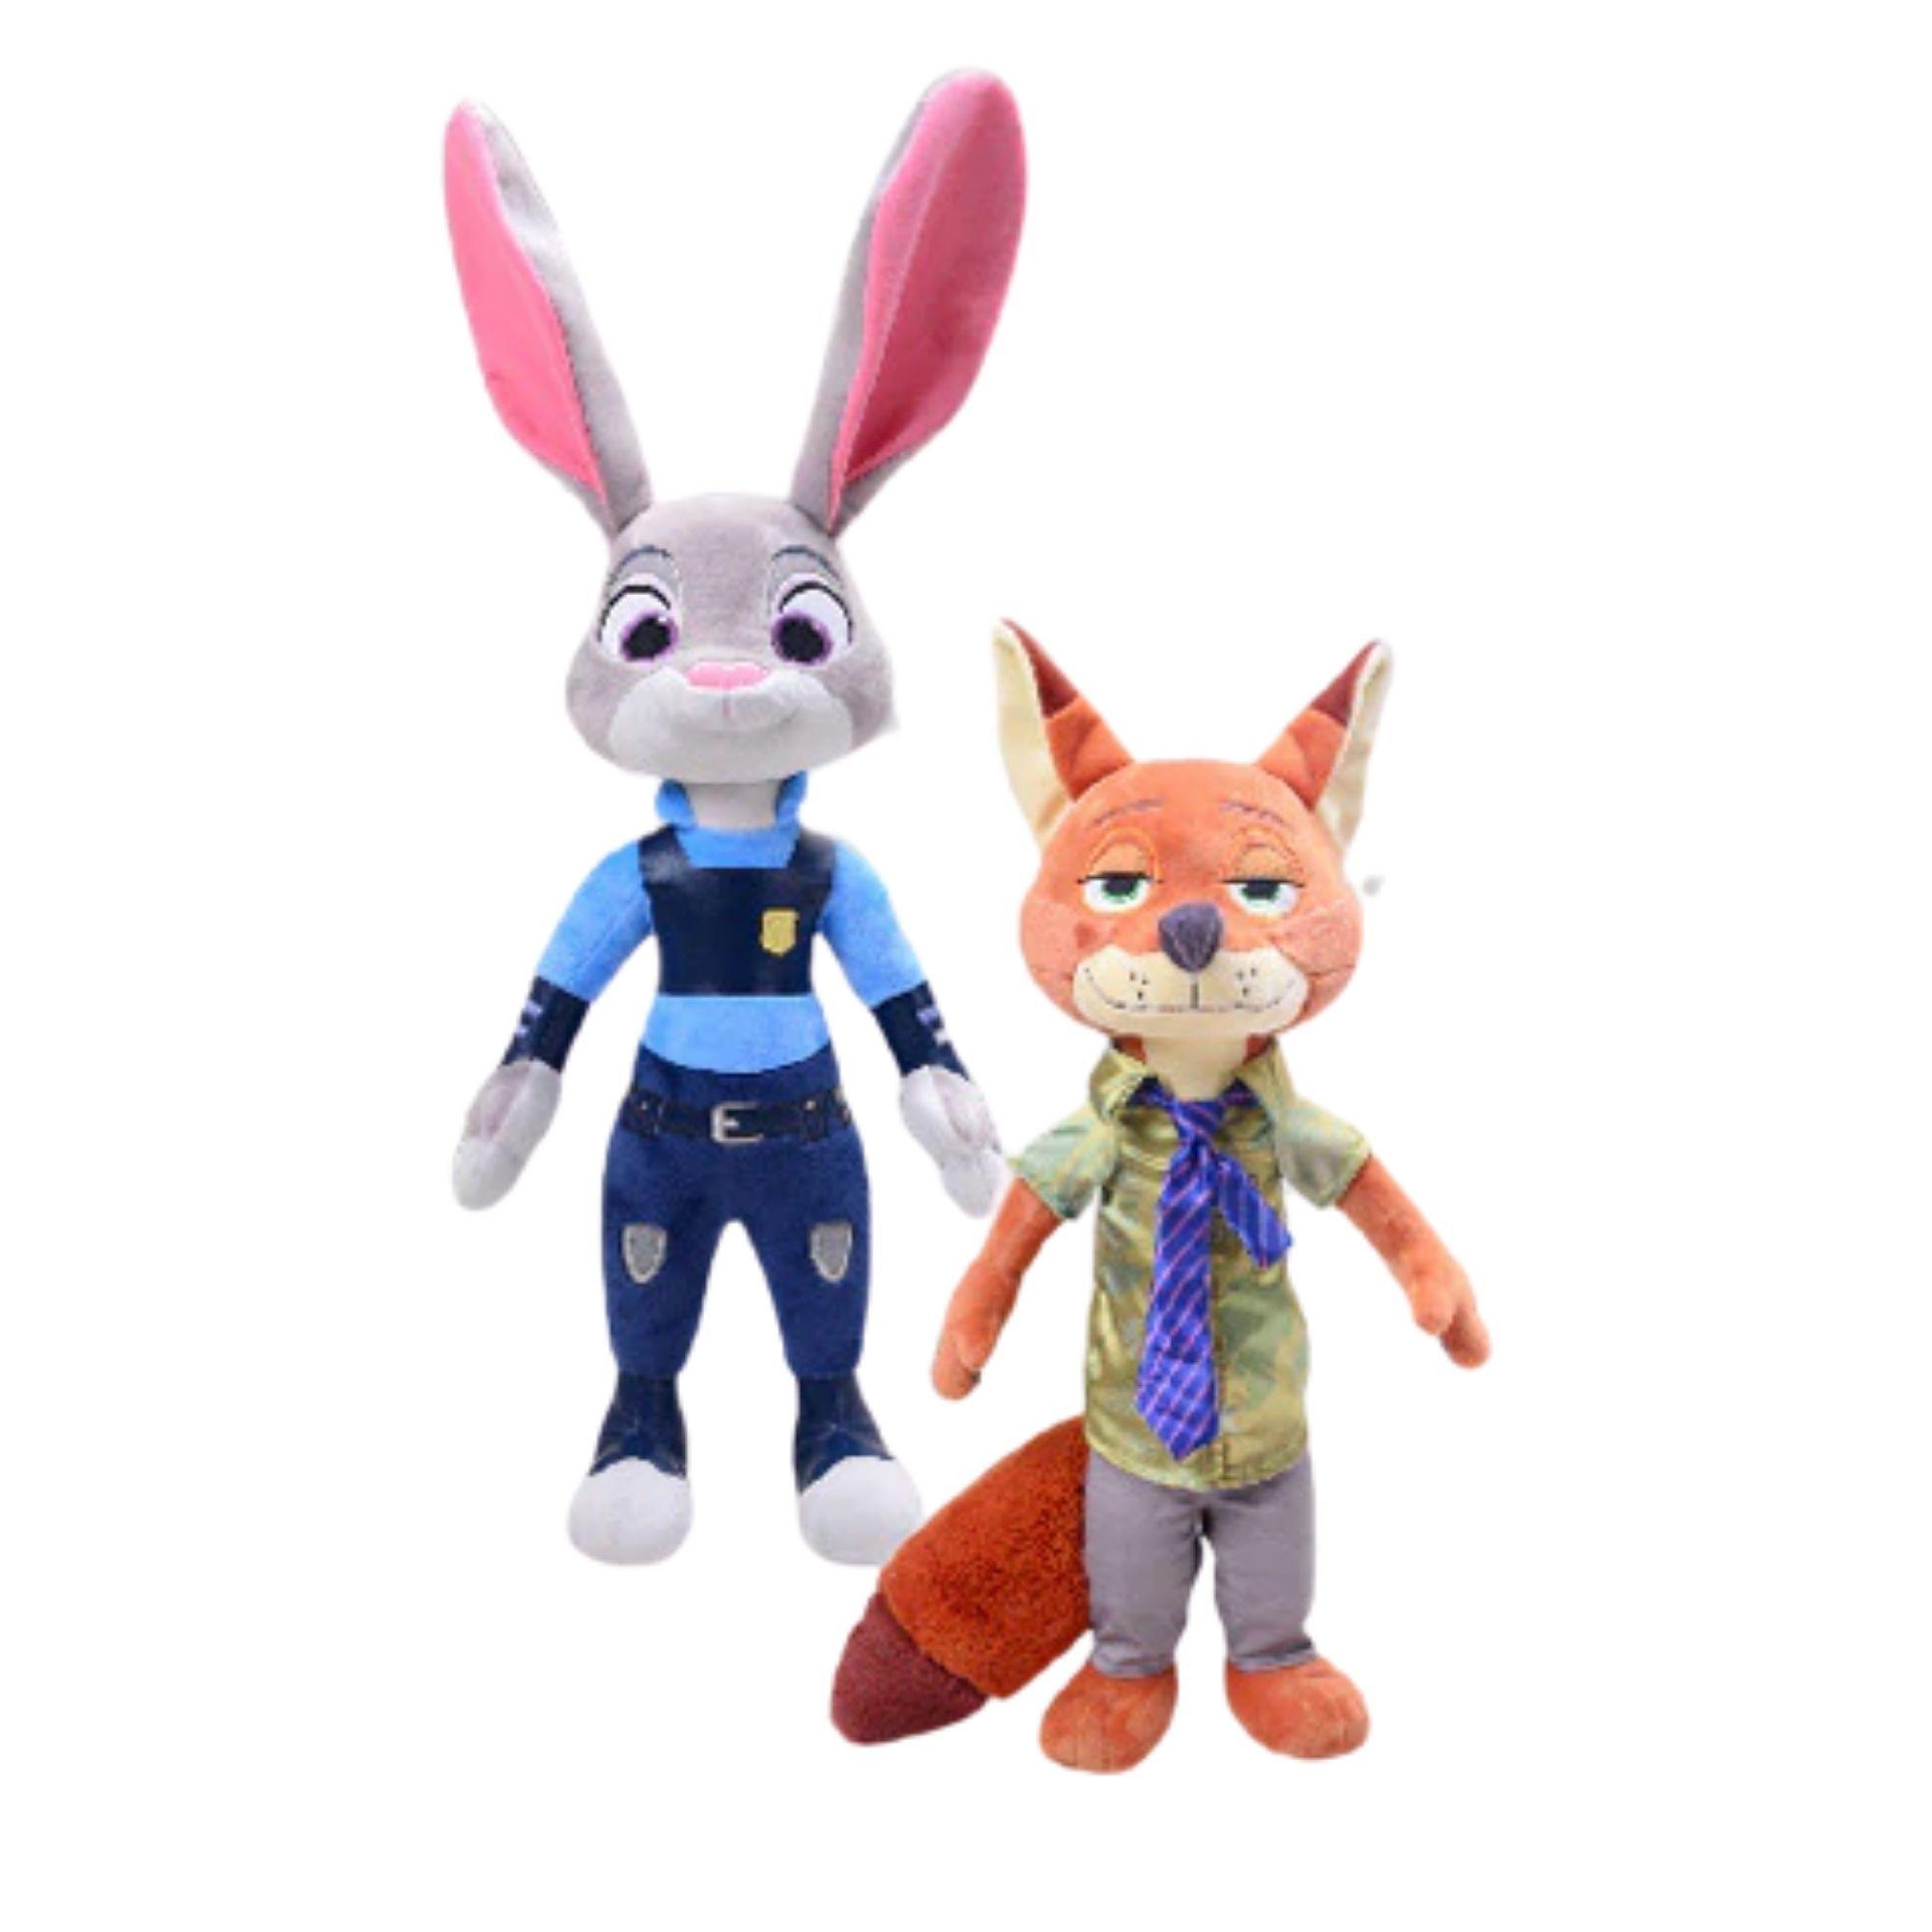 Zootopia Pelucia Judy Hopps e Nick Wilde   - Game Land Brinquedos